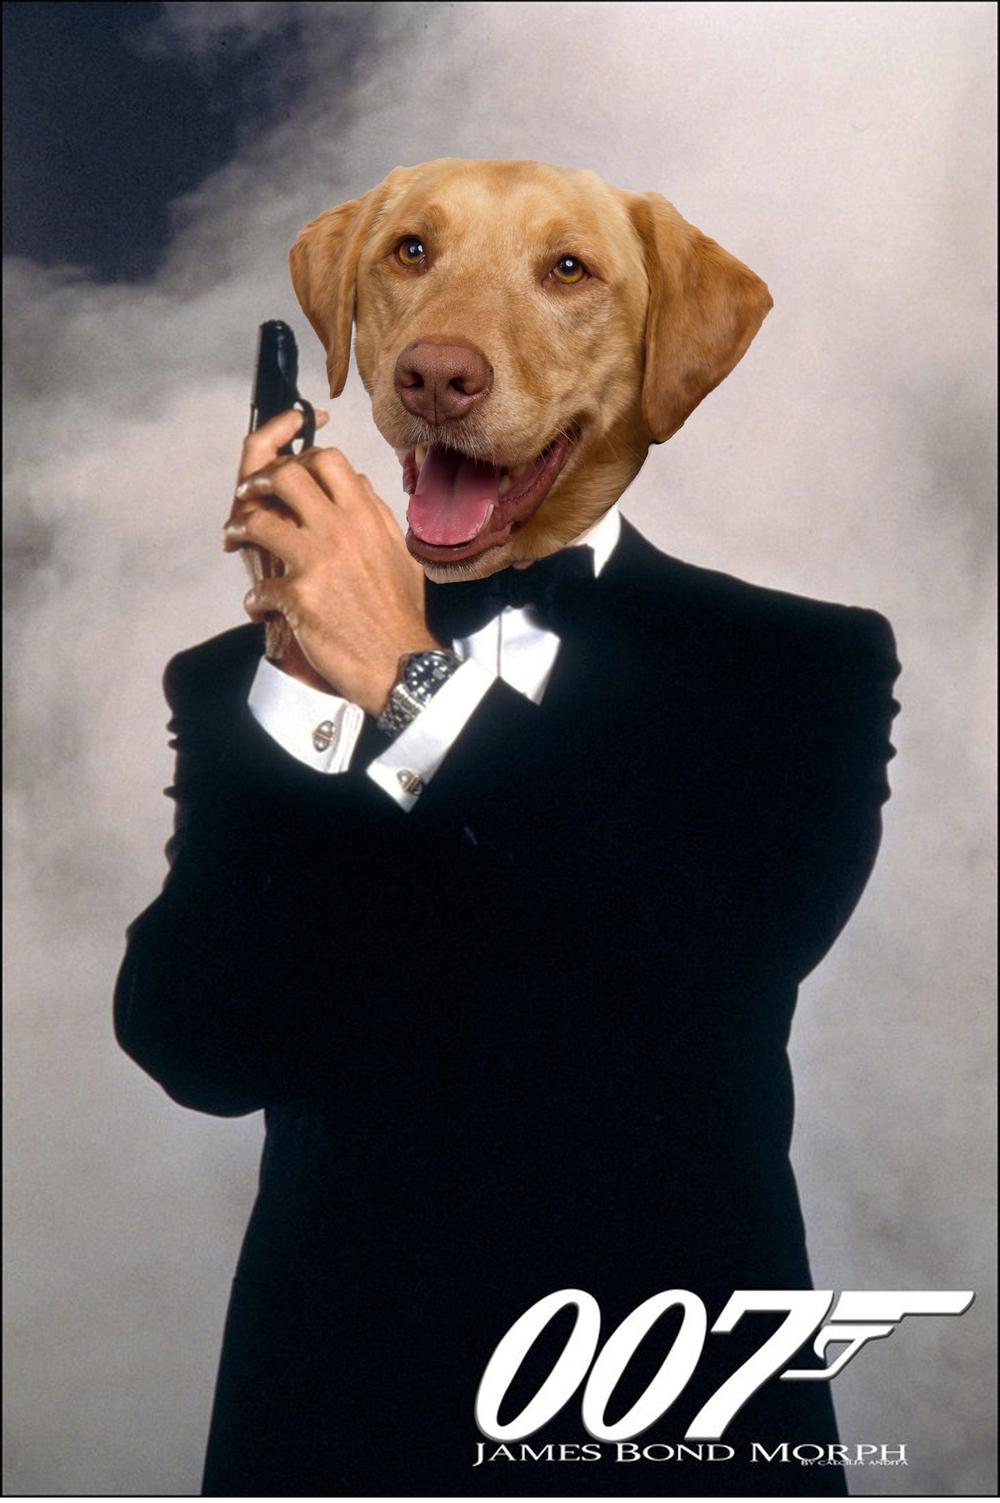 Hurley the Labrador as James Bond